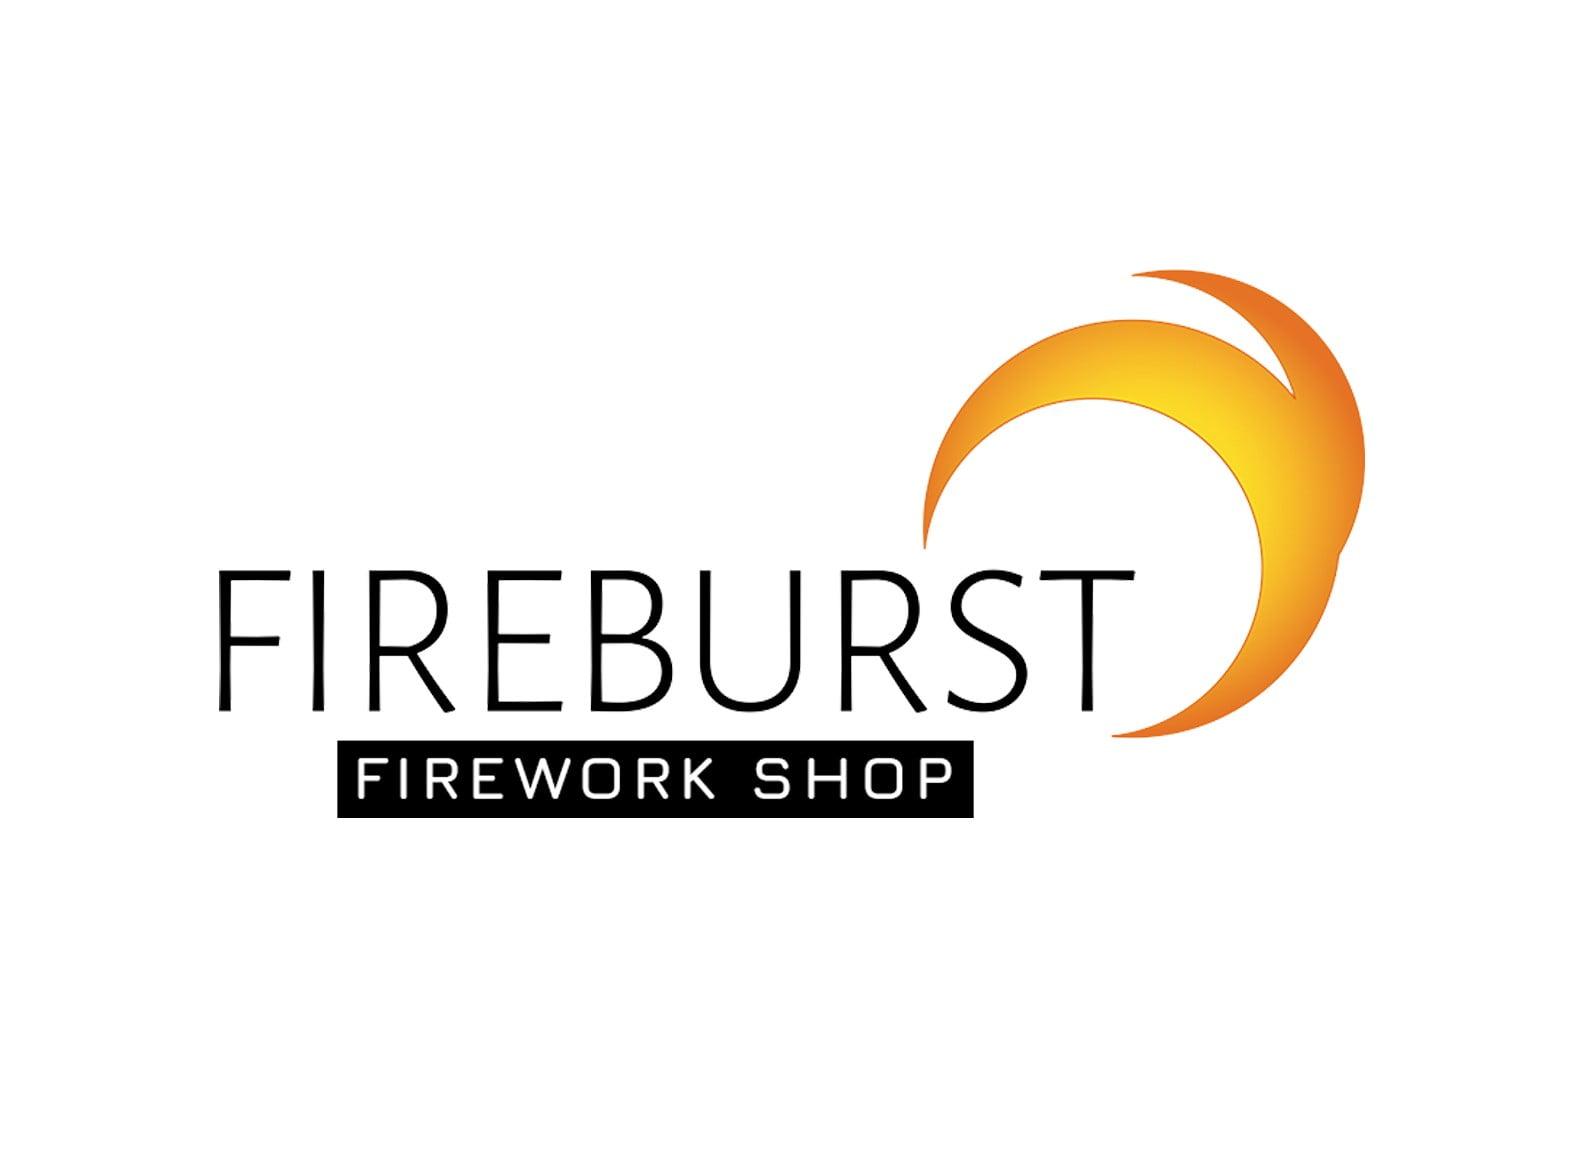 Fireburst Fireworks - Buy fireworks near me